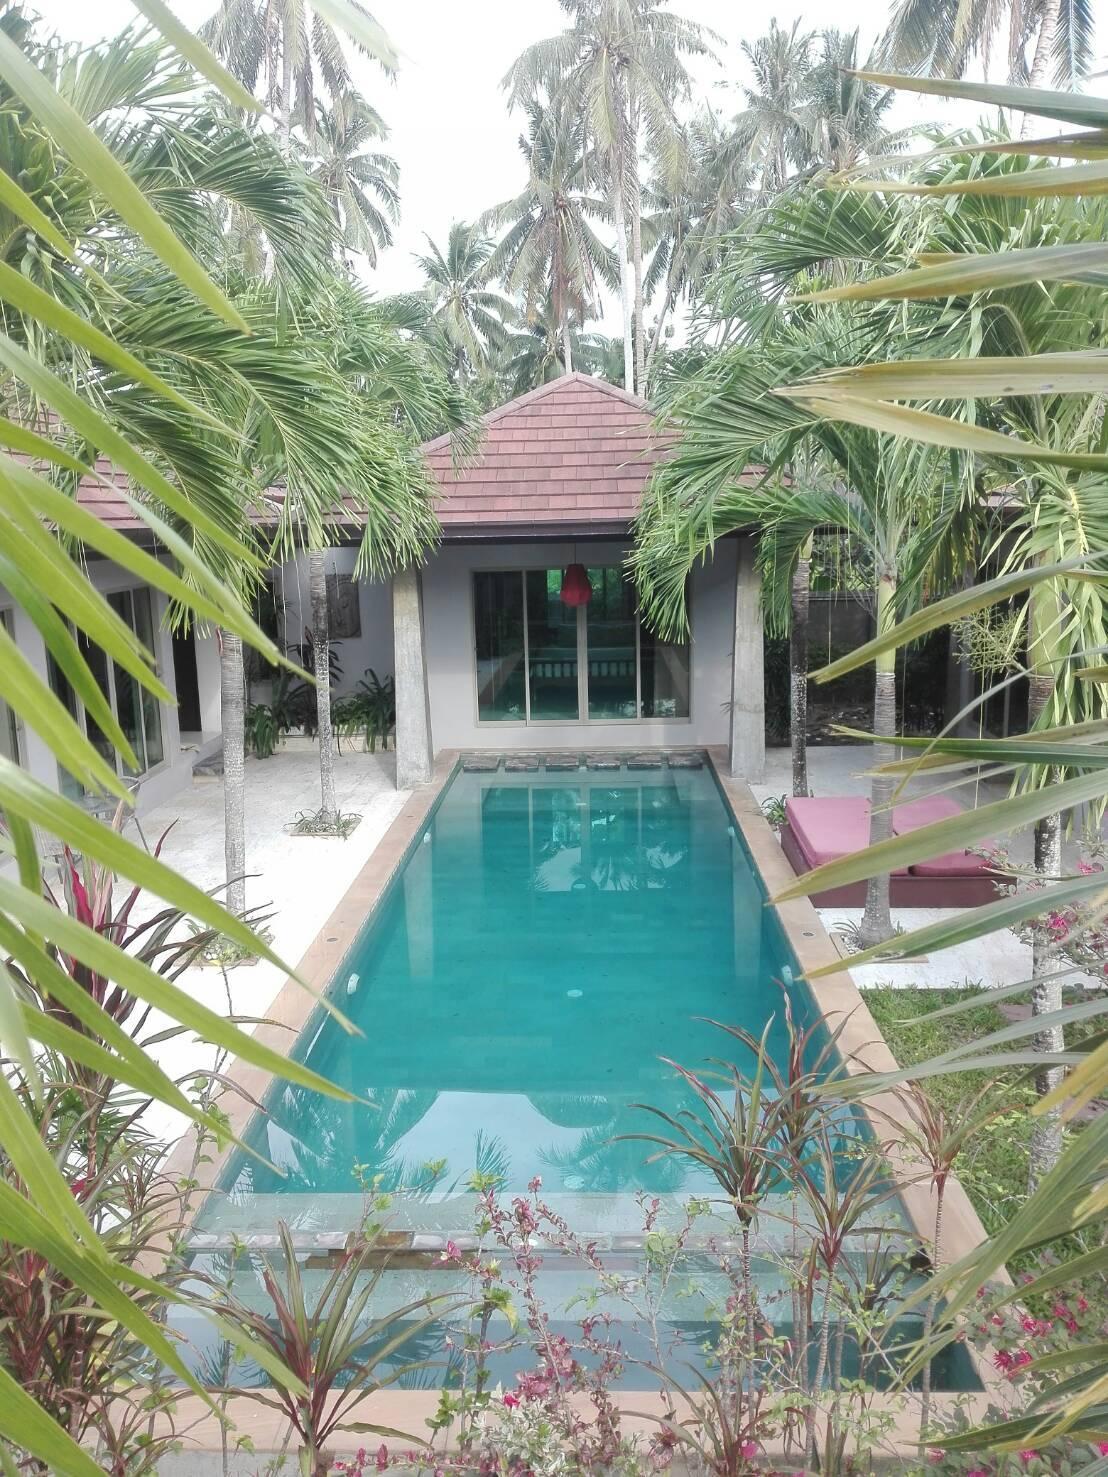 Bali Style Private Villa 1  by Natasak วิลลา 3 ห้องนอน 3 ห้องน้ำส่วนตัว ขนาด 700 ตร.ม. – แม่น้ำ